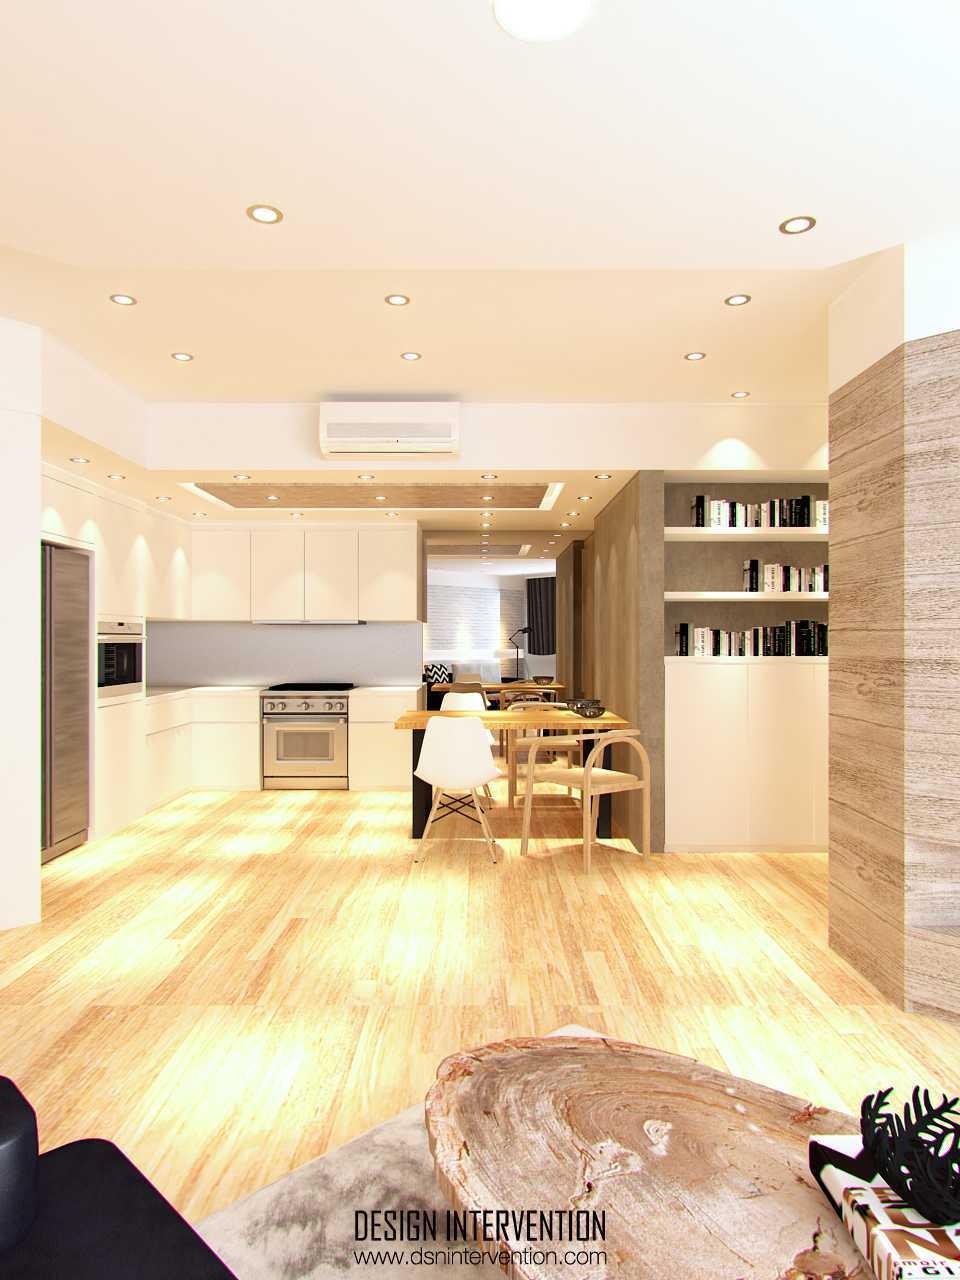 Dapur rumah mewah PK Apartment karyaDESIGN INTERVENTION [Sumber: arsitag.com]